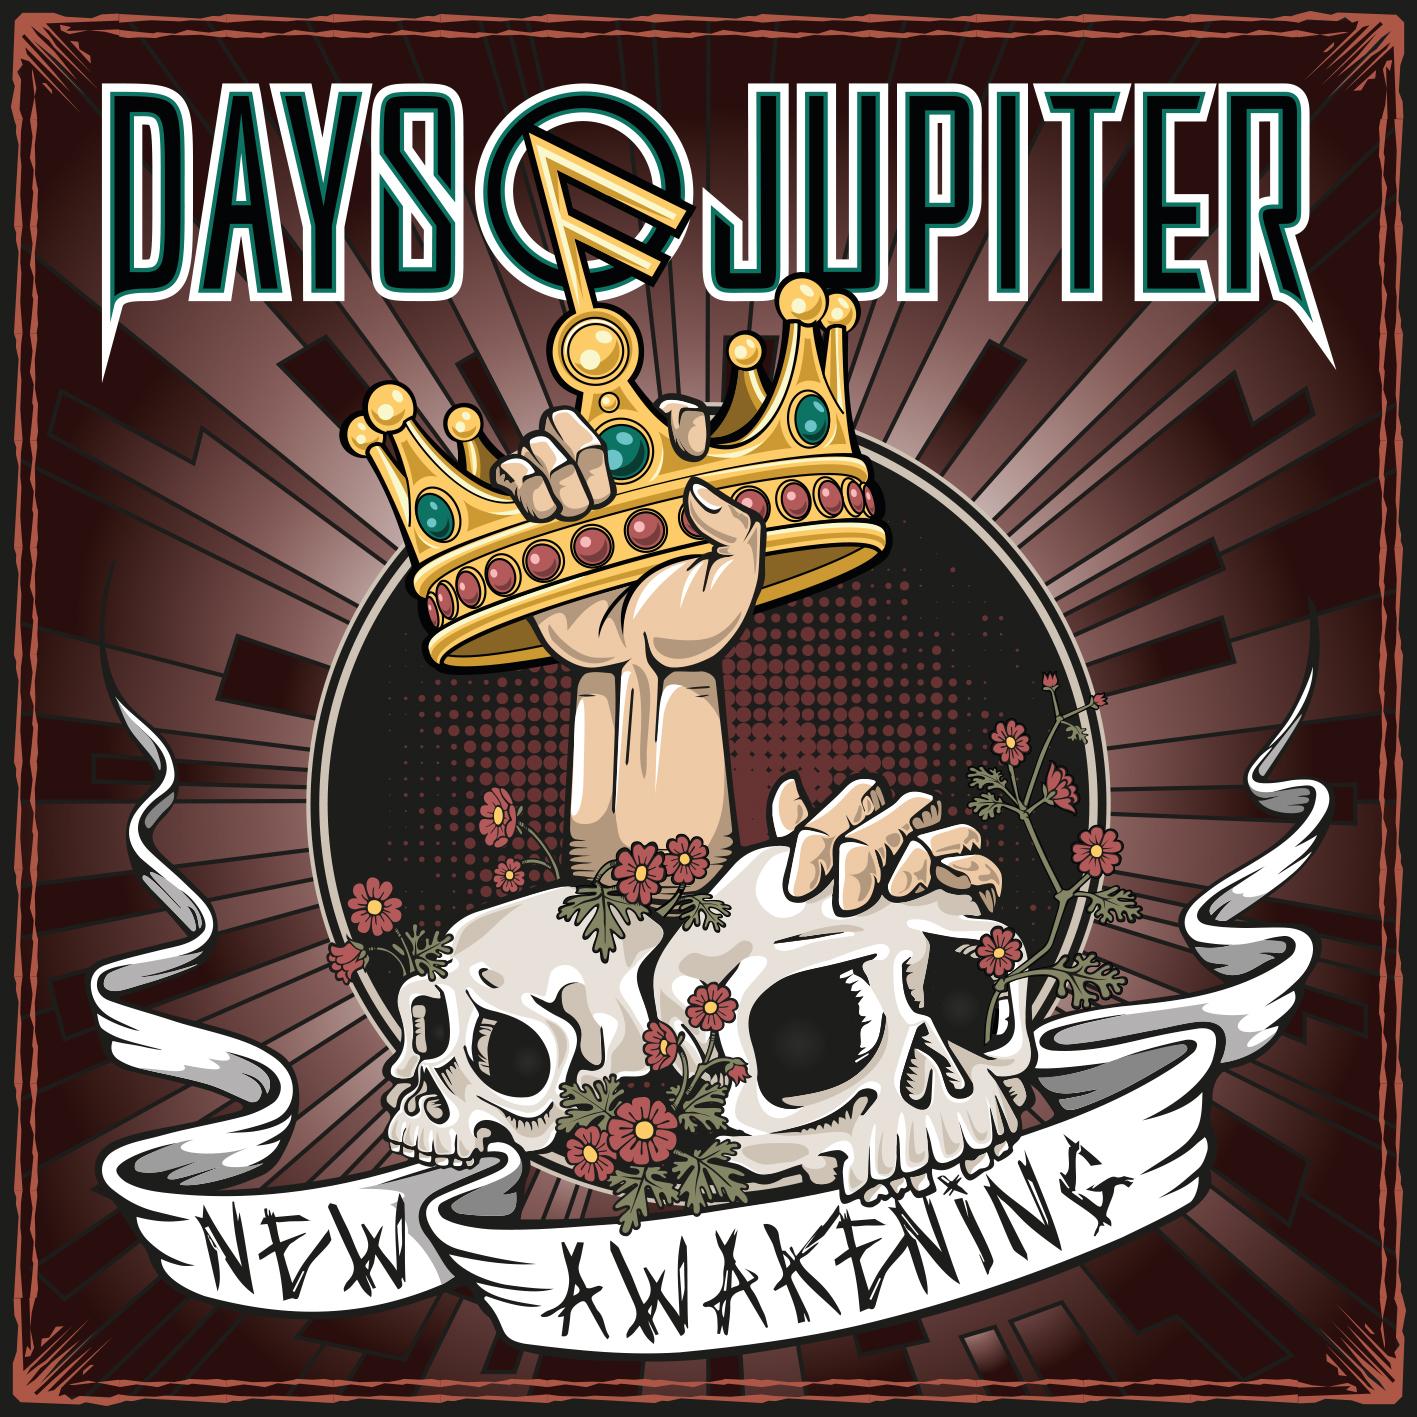 DaysOfJupiter_NewAwakening_Cover